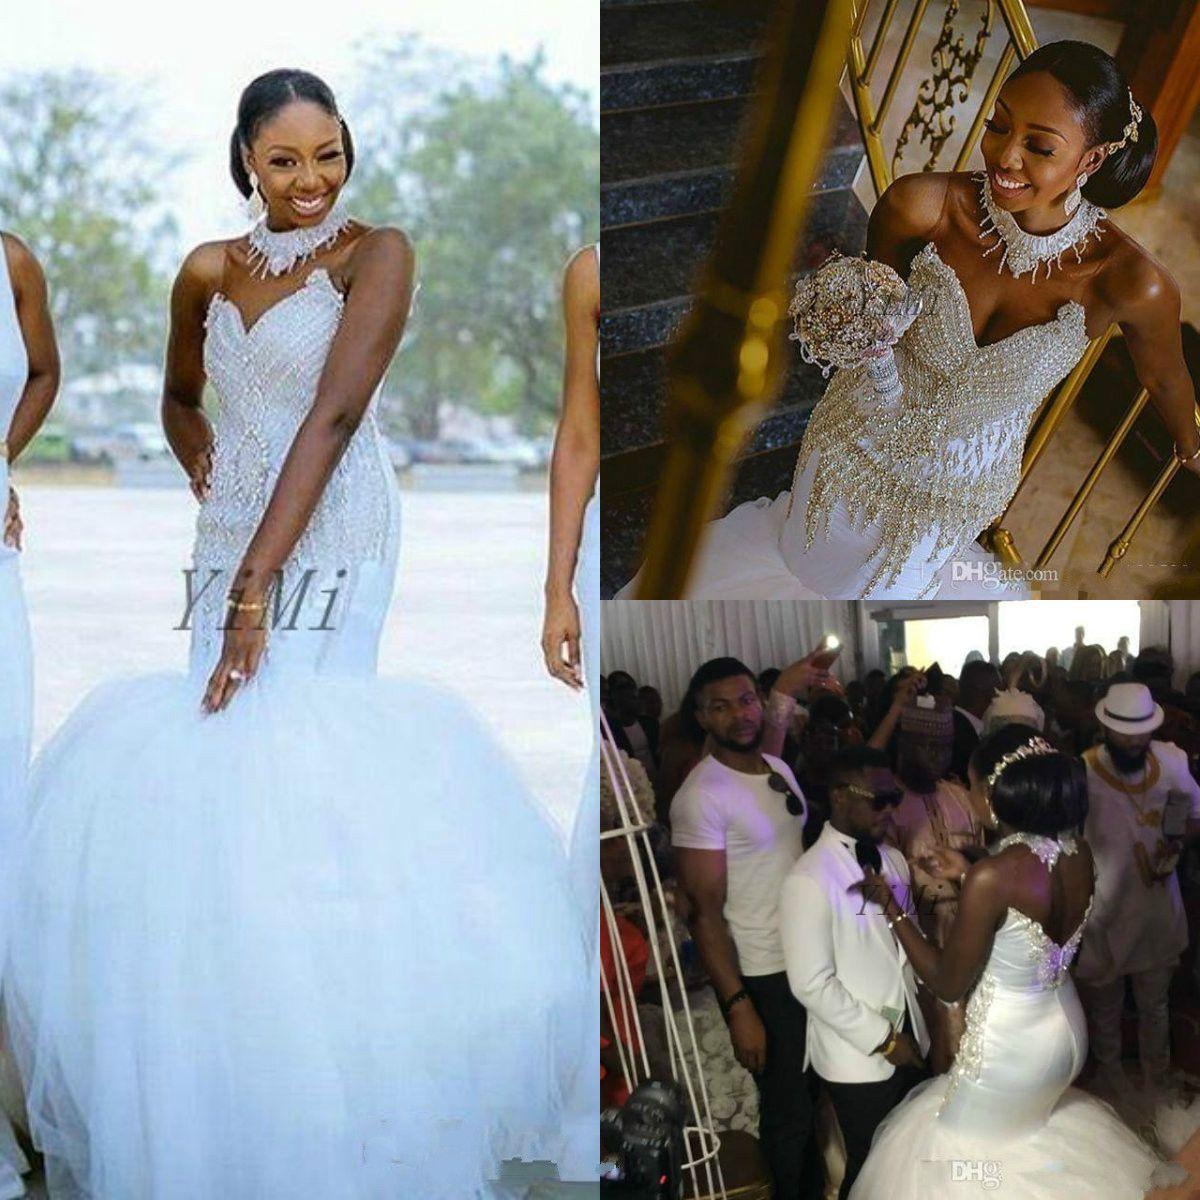 Crystal Mermaid Wedding Dresses 2019 See Through Court Train Appliques Major Beading African Chapel Garden Bridal Gowns vestido de novia